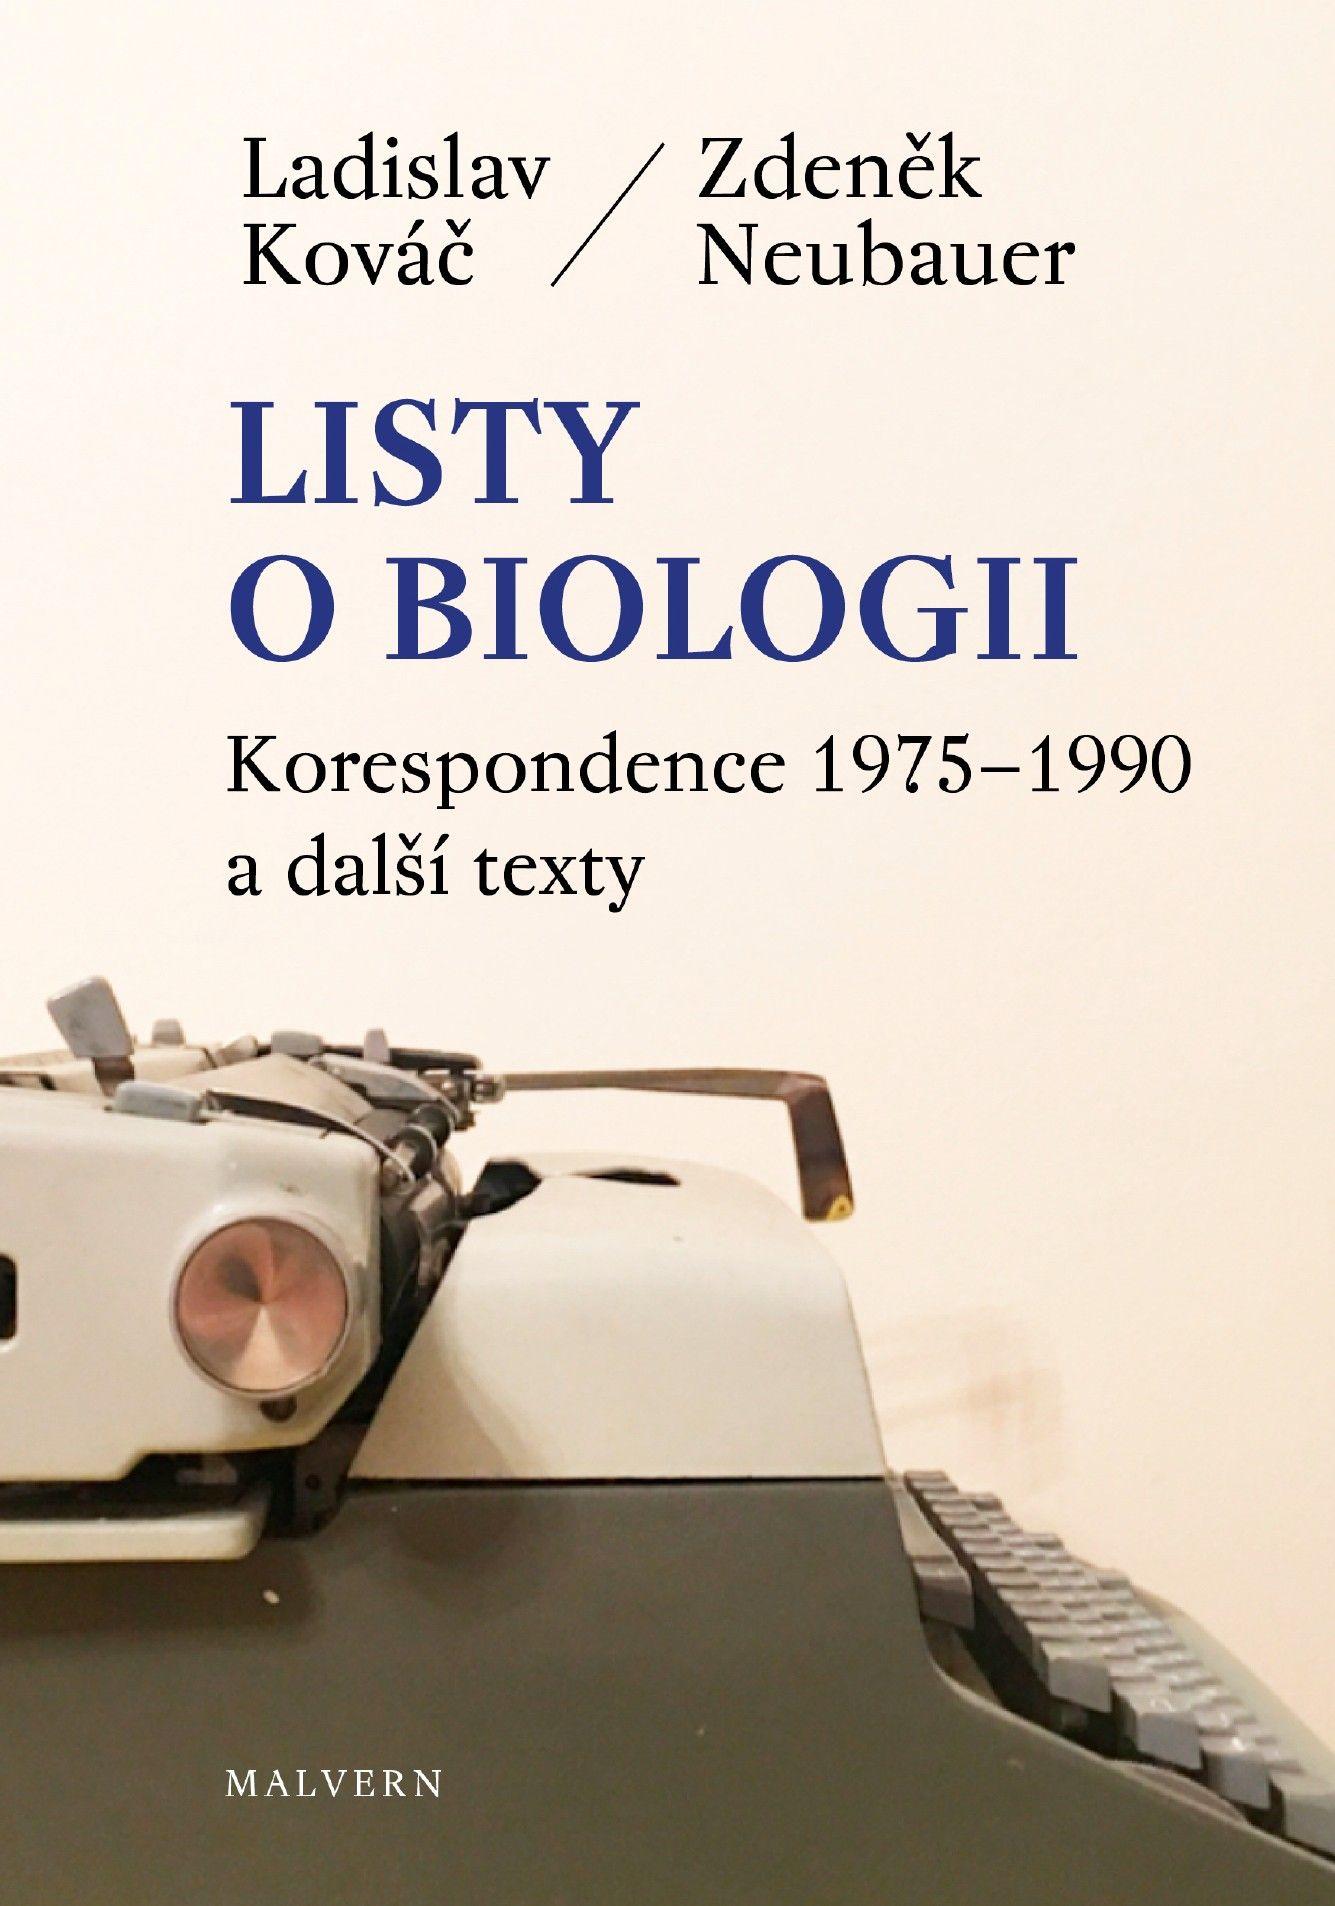 Zdeněk Neubauer, Ladislav Kováč: Listy o biologii (Korespondence 1975–1990 a další texty)